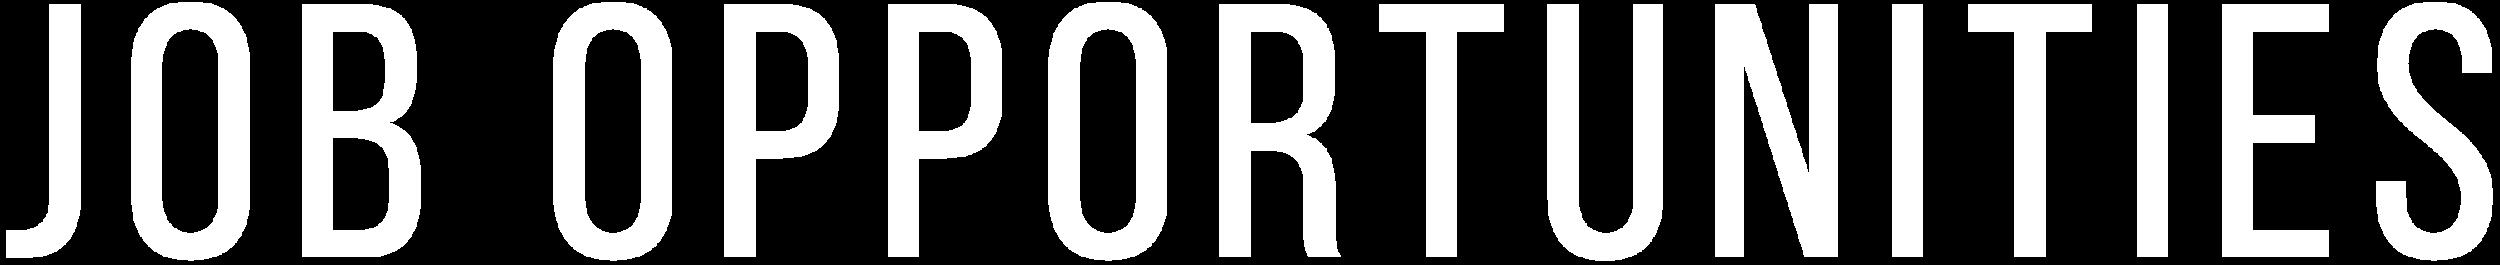 logo_jobs.png